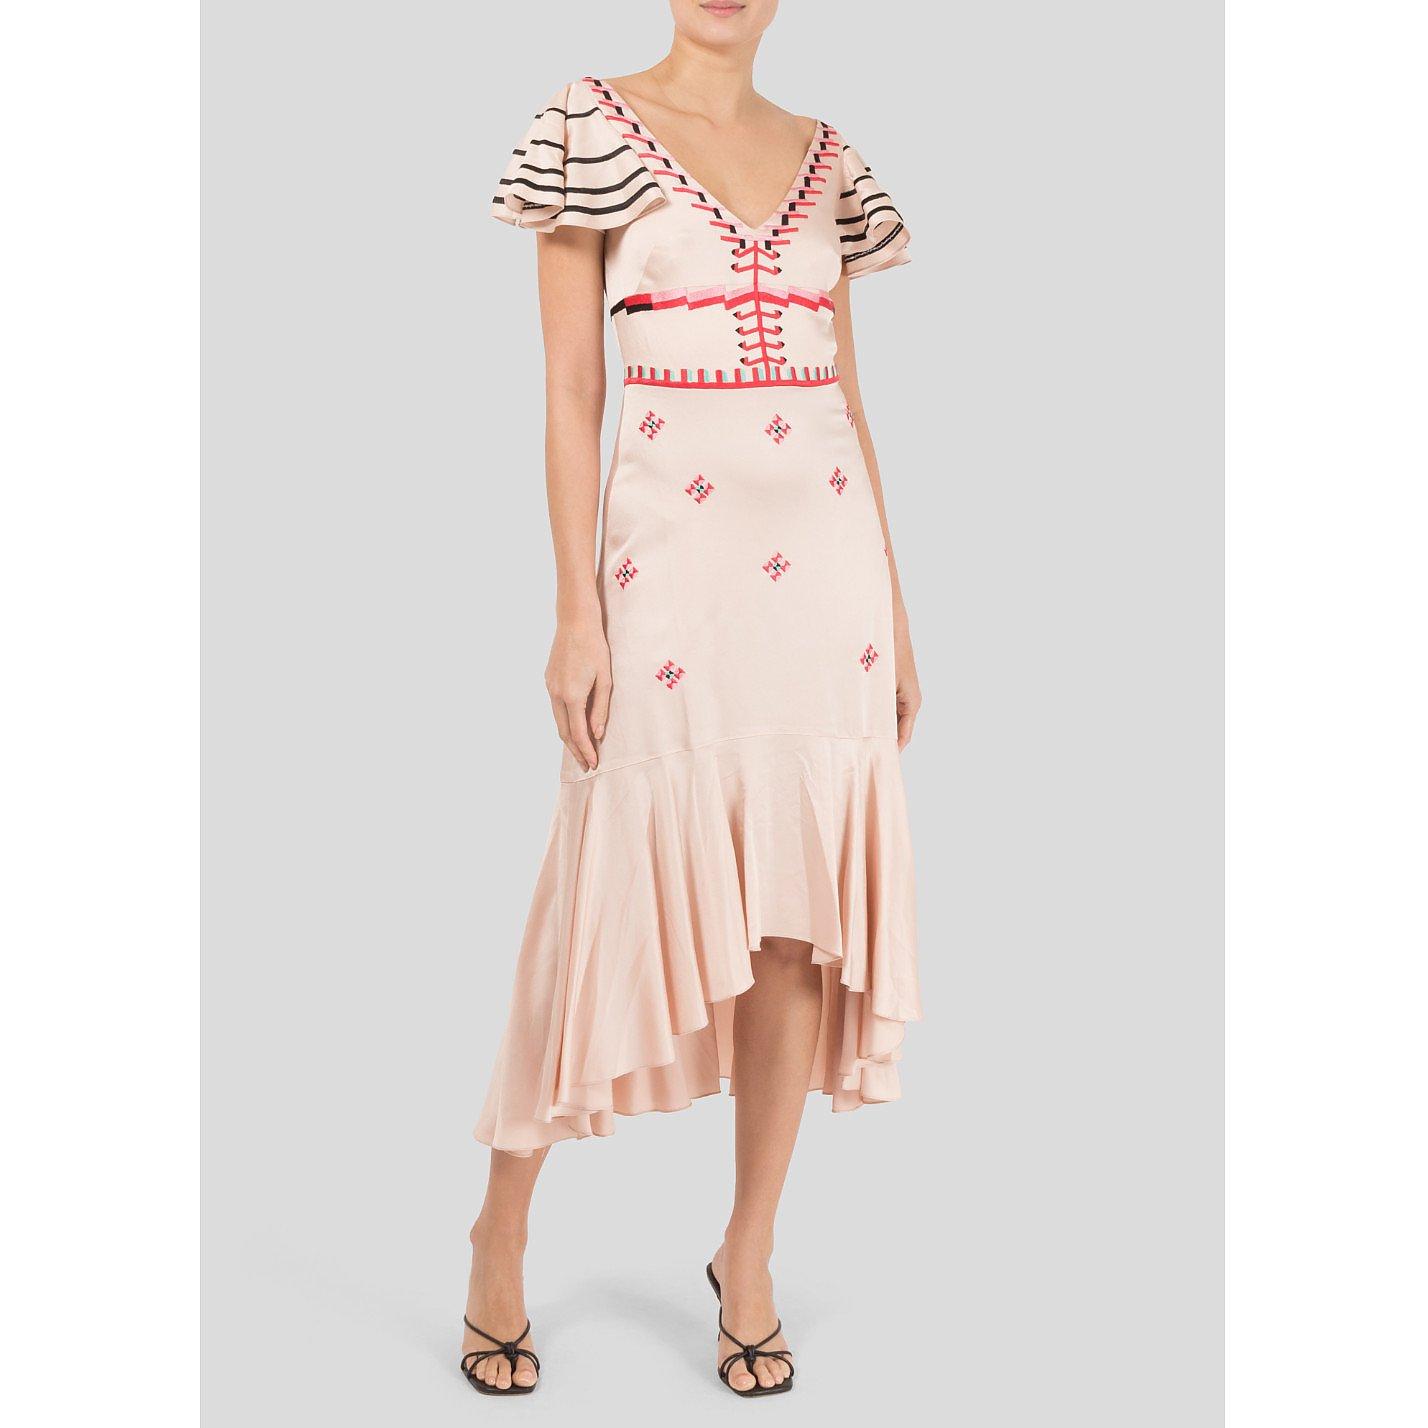 Temperley London Traveller Dress